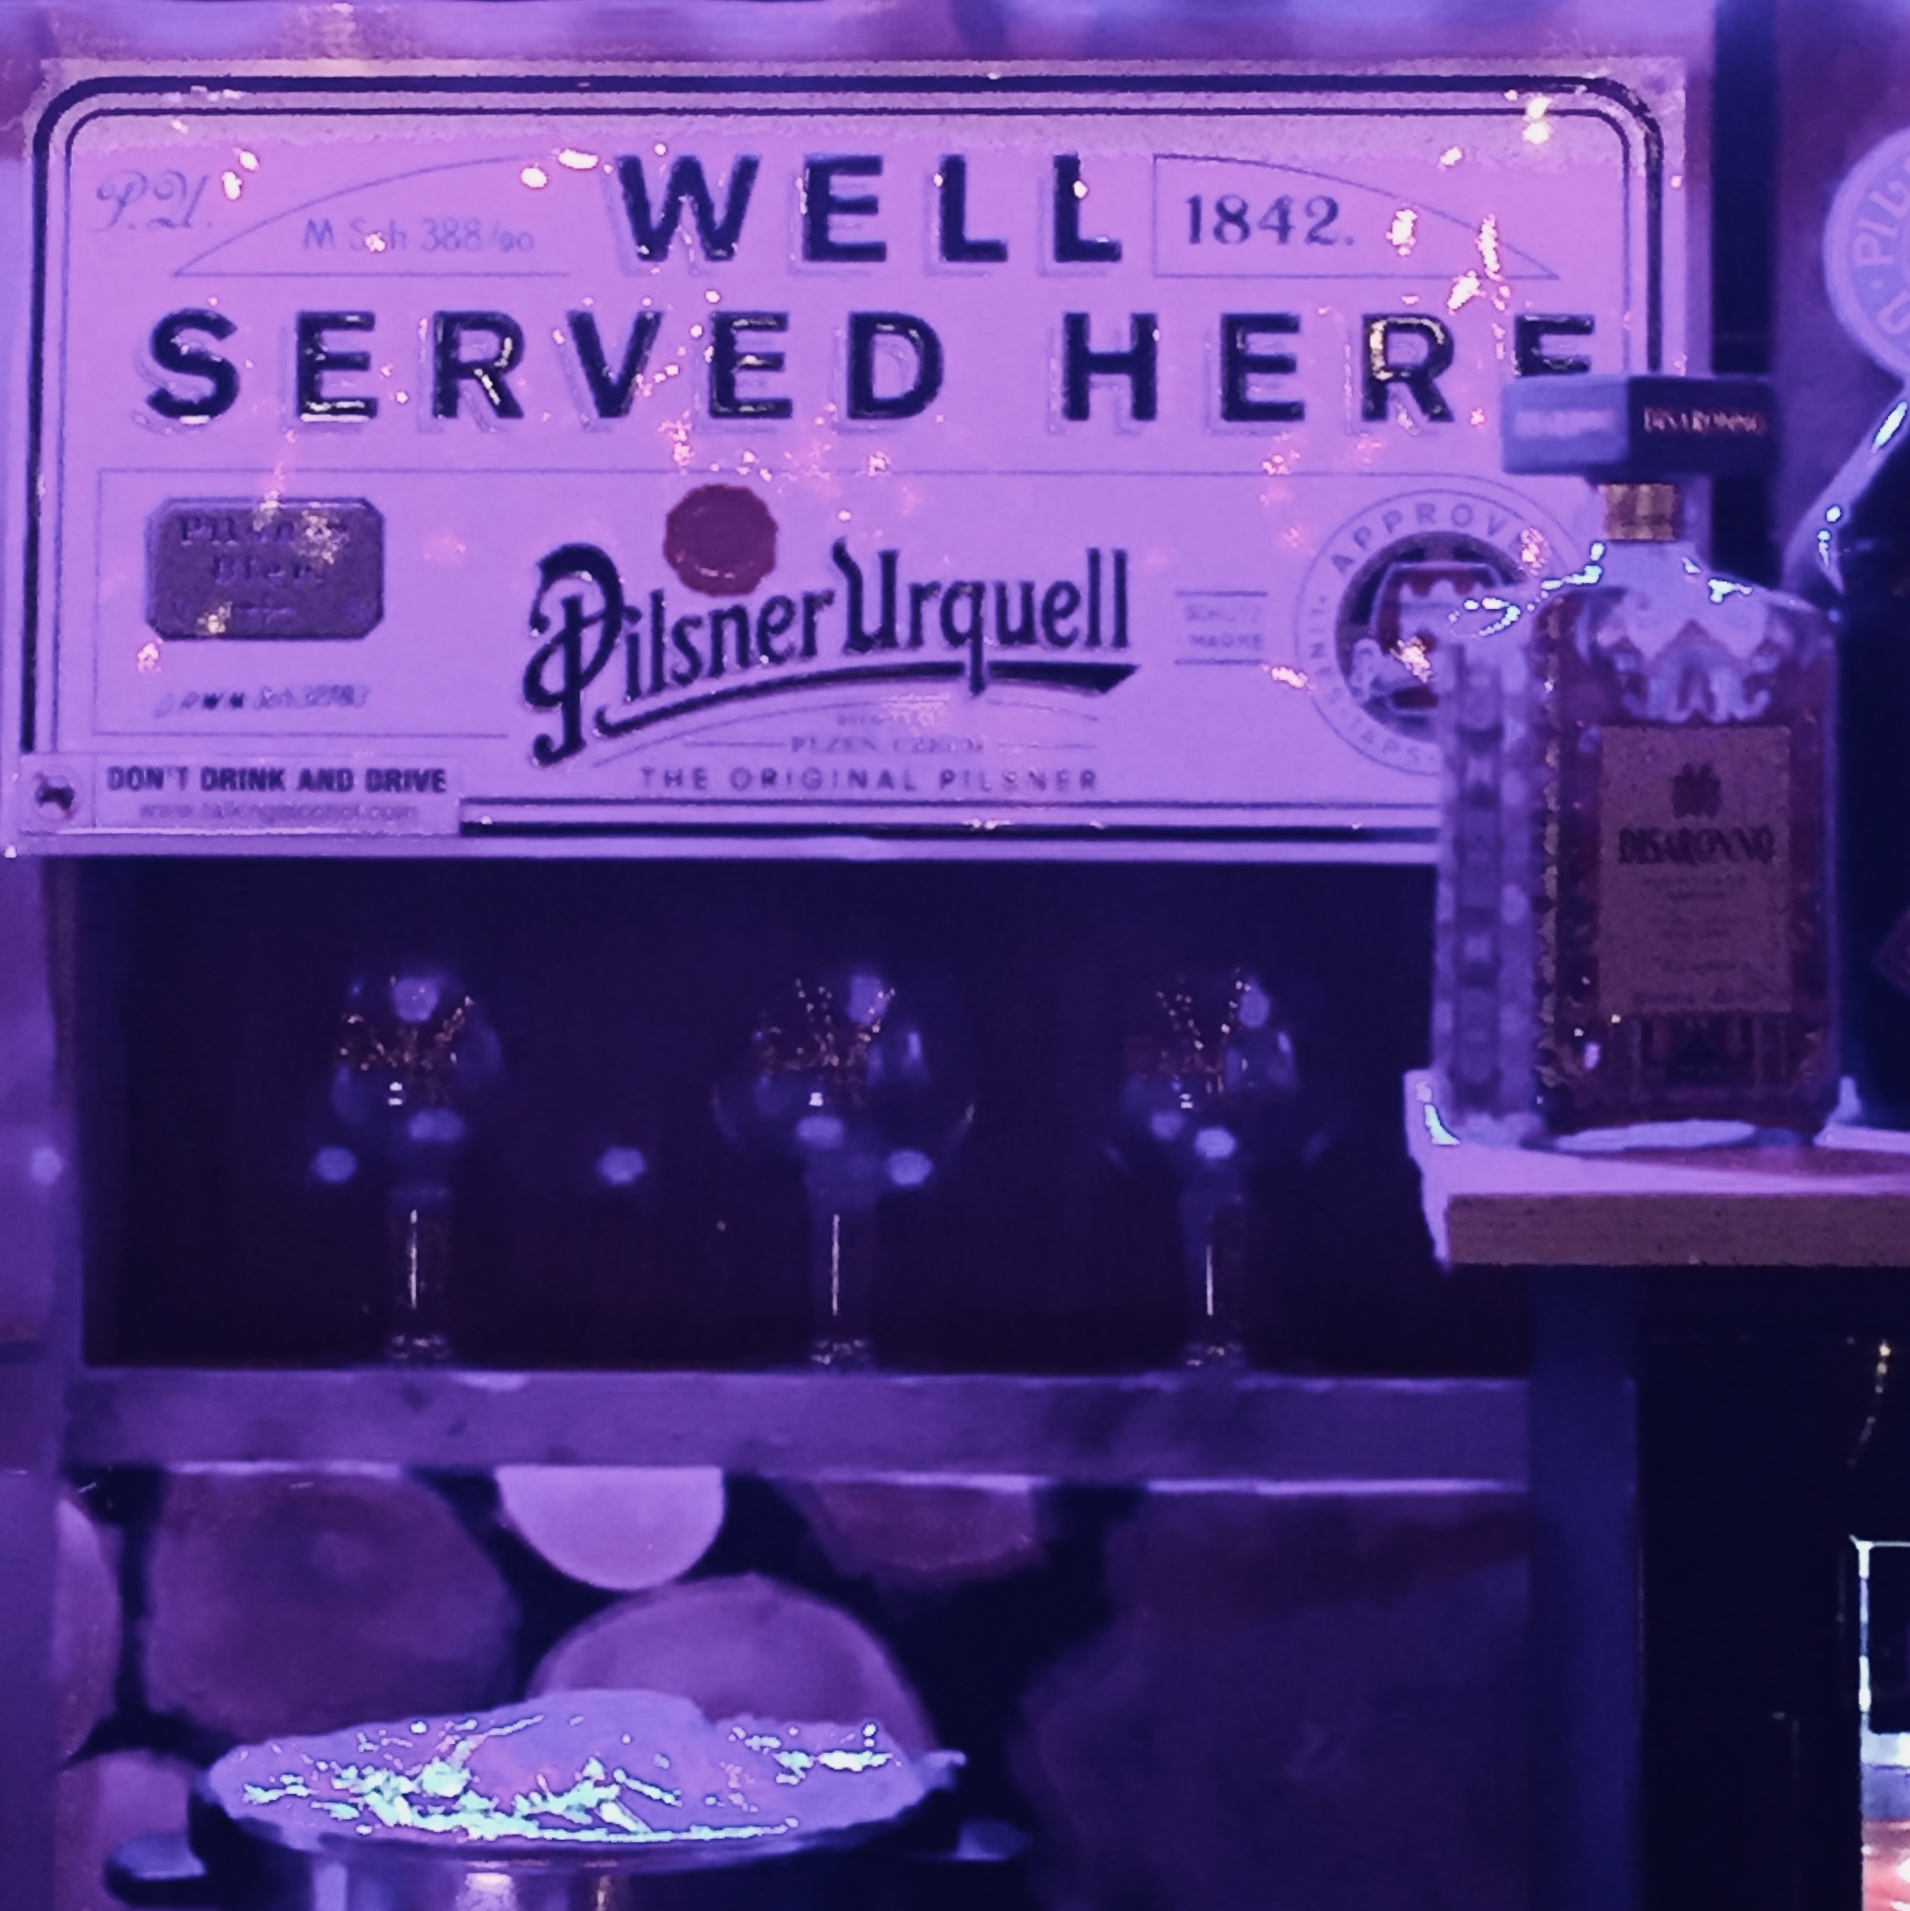 Pilsner Urquell Sponsorship